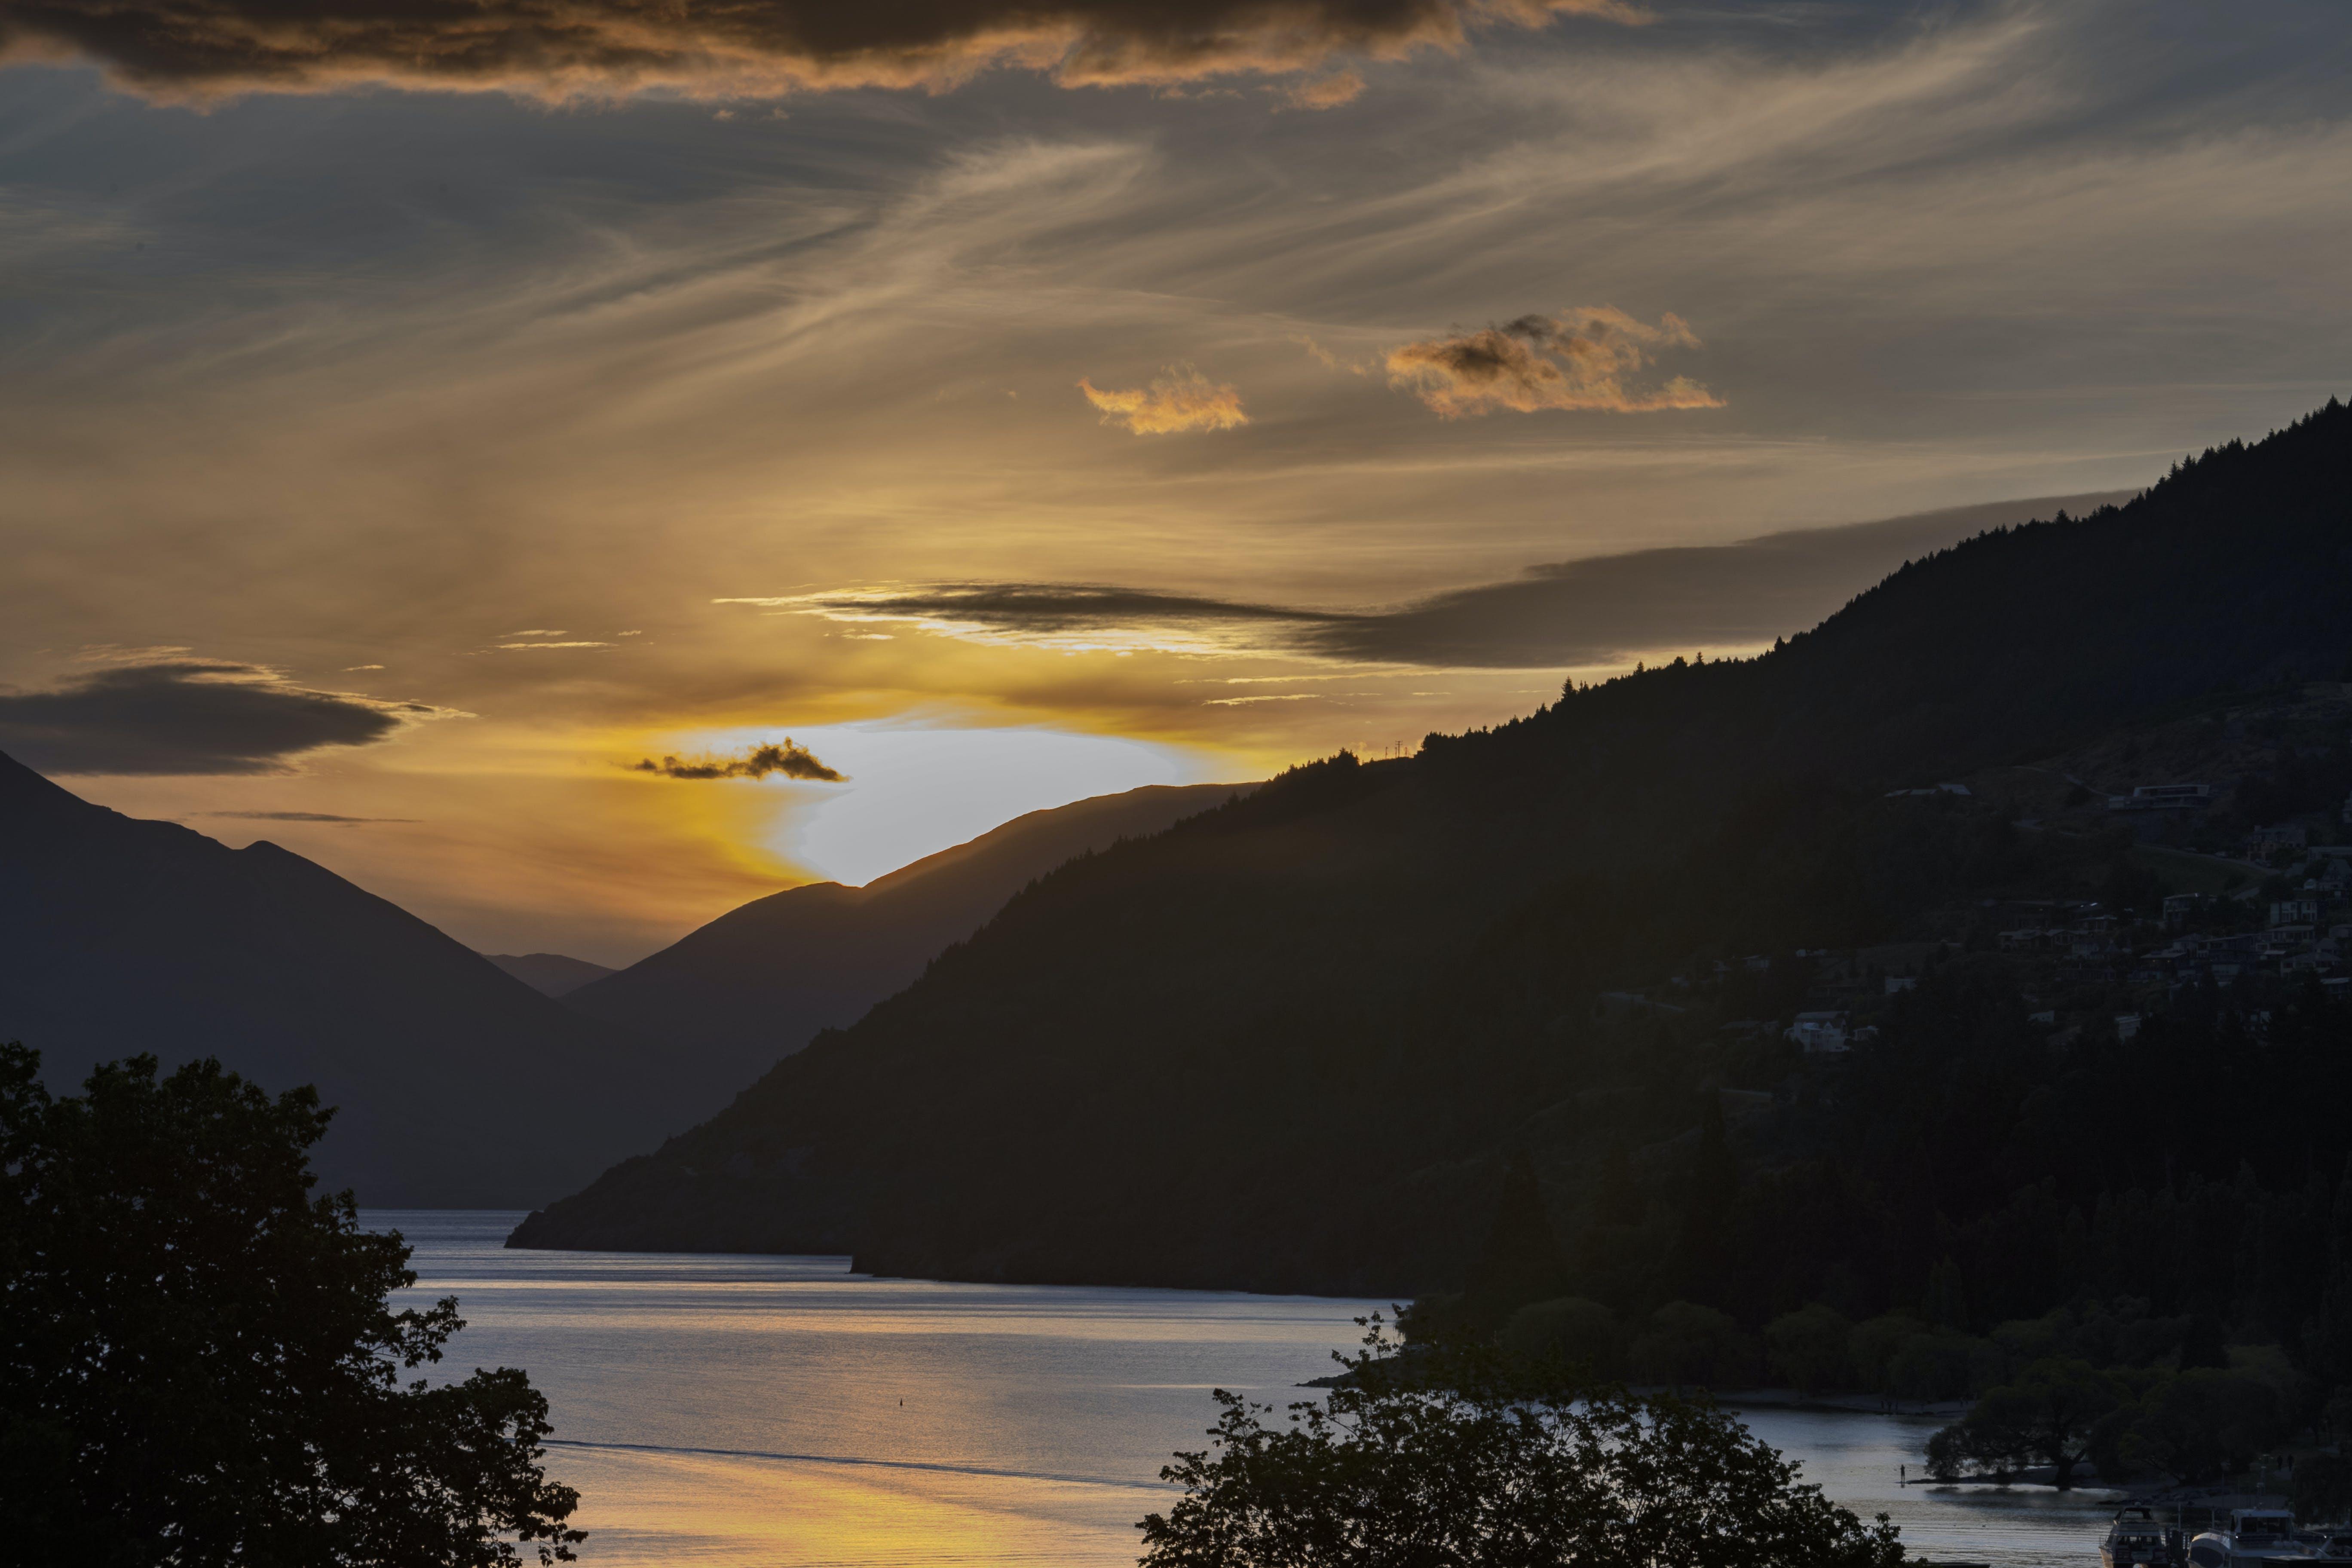 Free stock photo of body of water, clouds, golden sunset, lake wakatipu